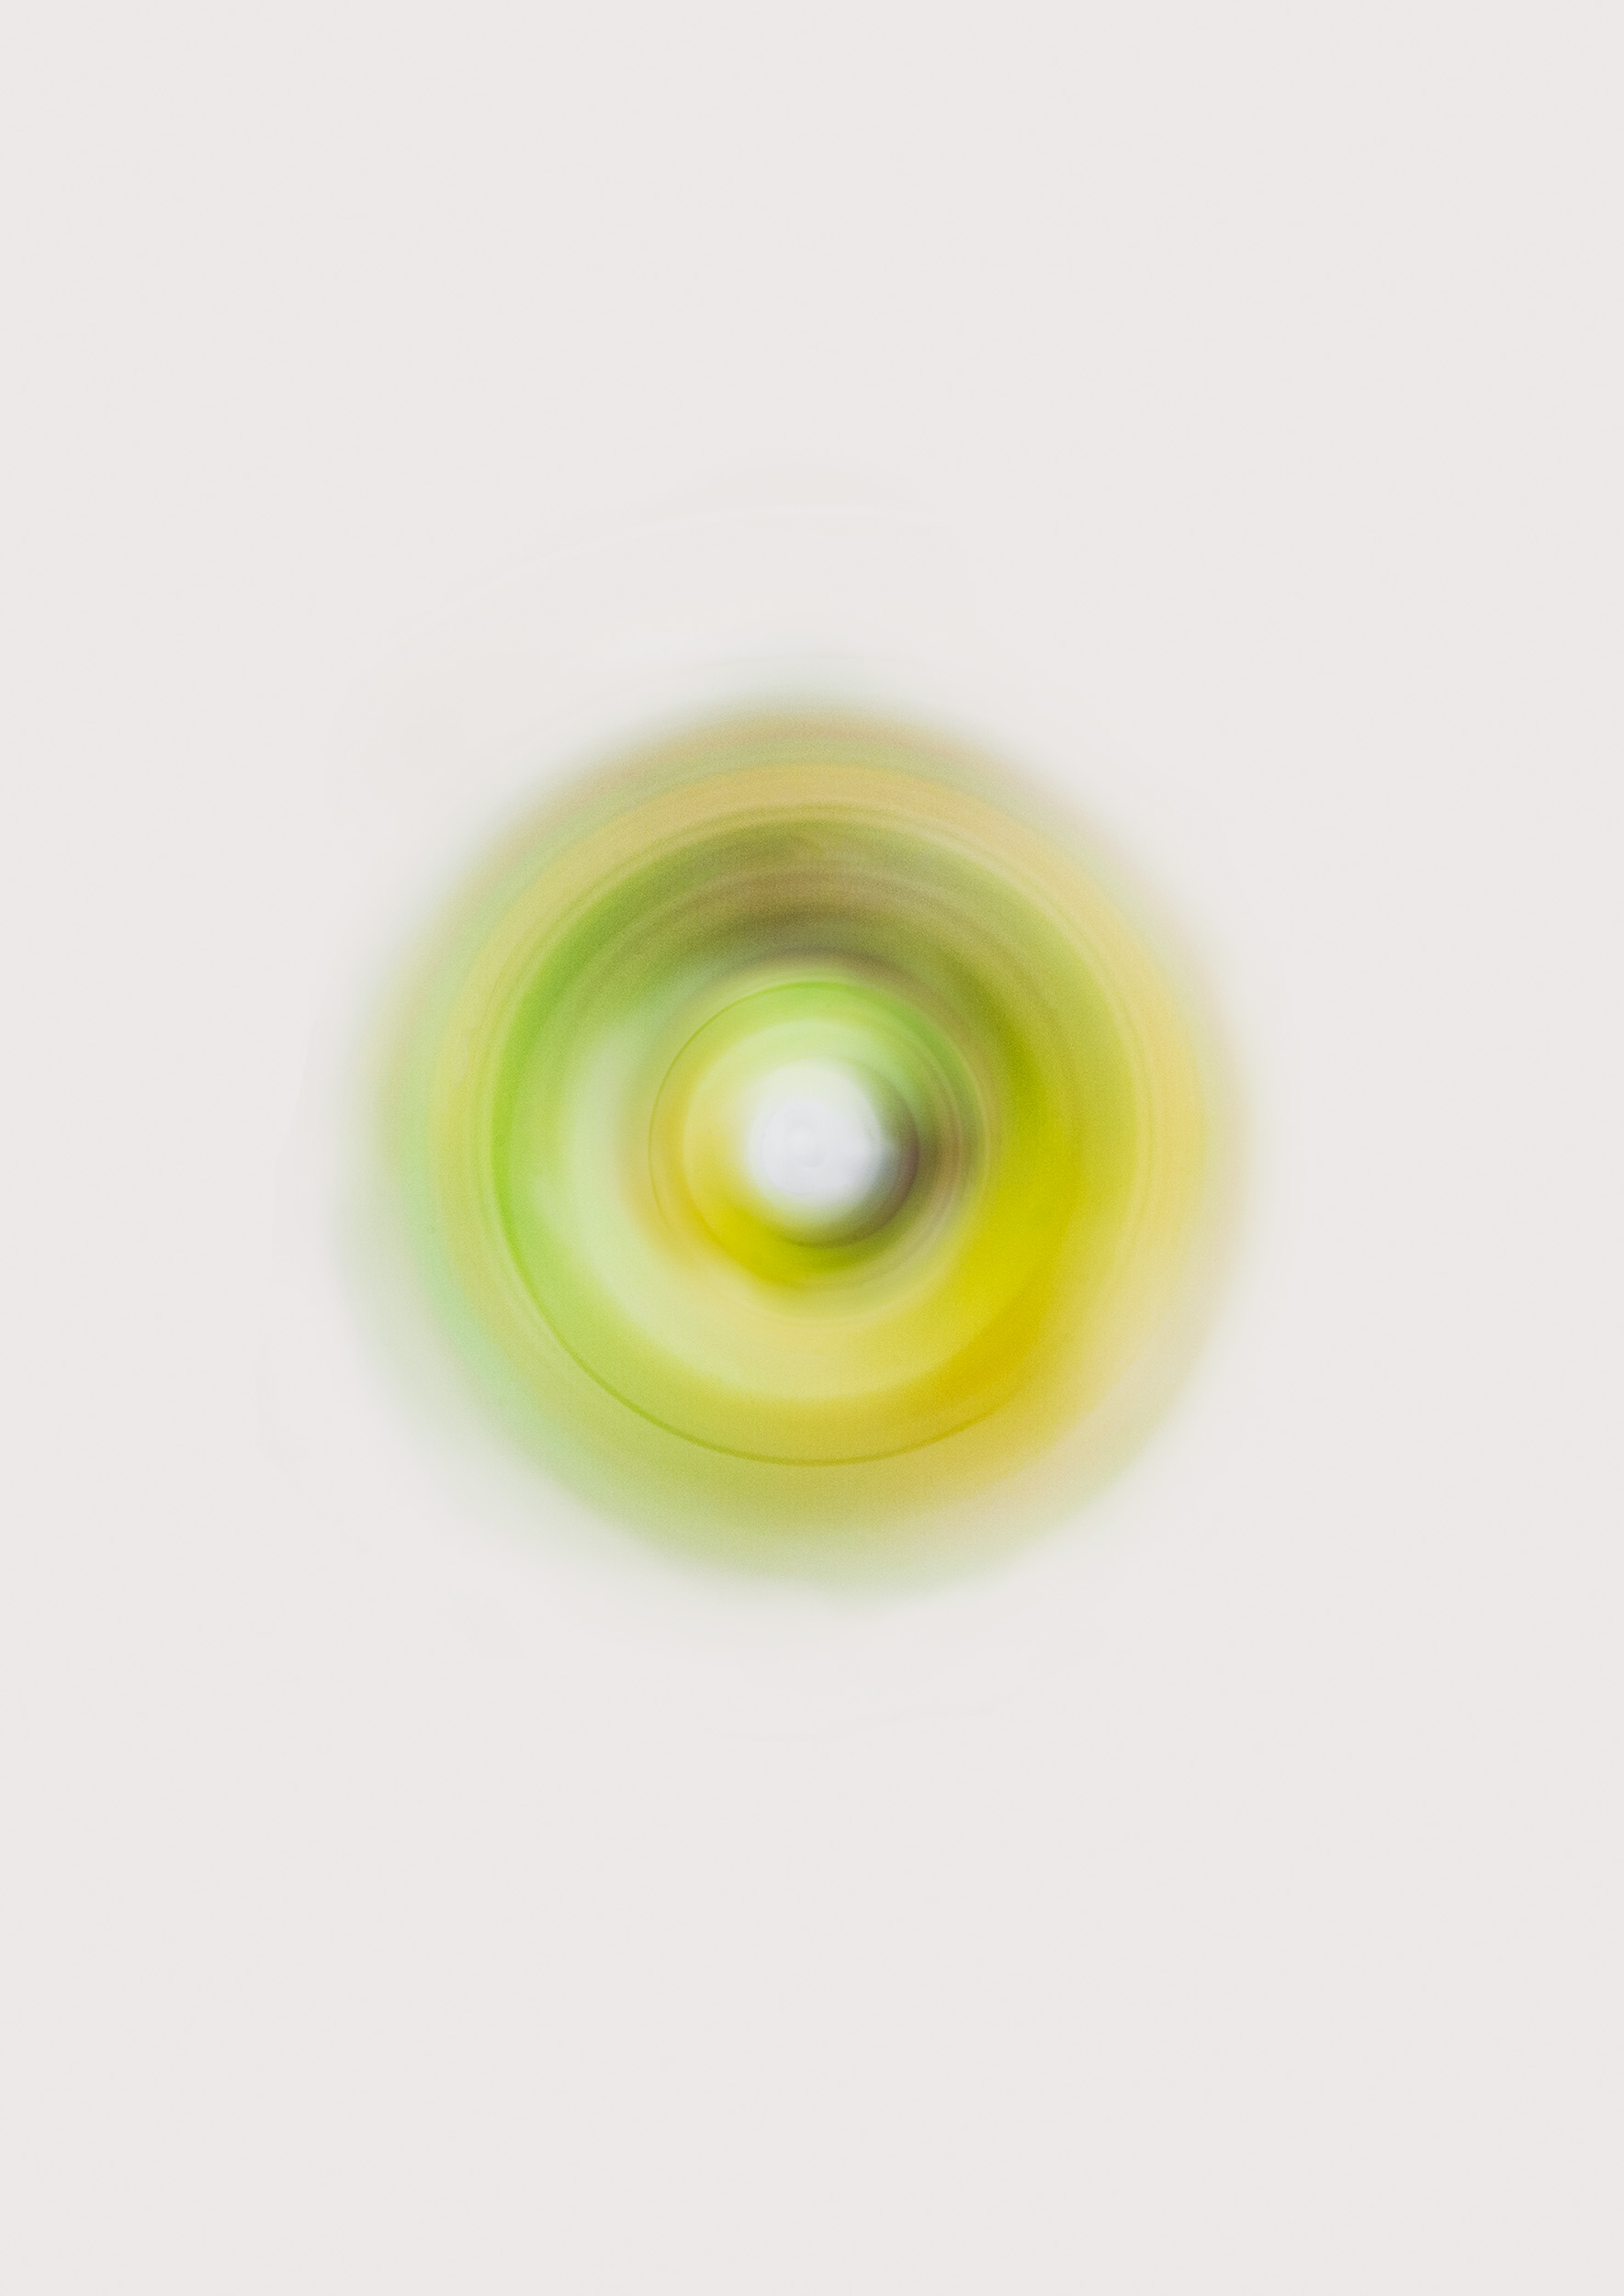 Farben_6.jpg